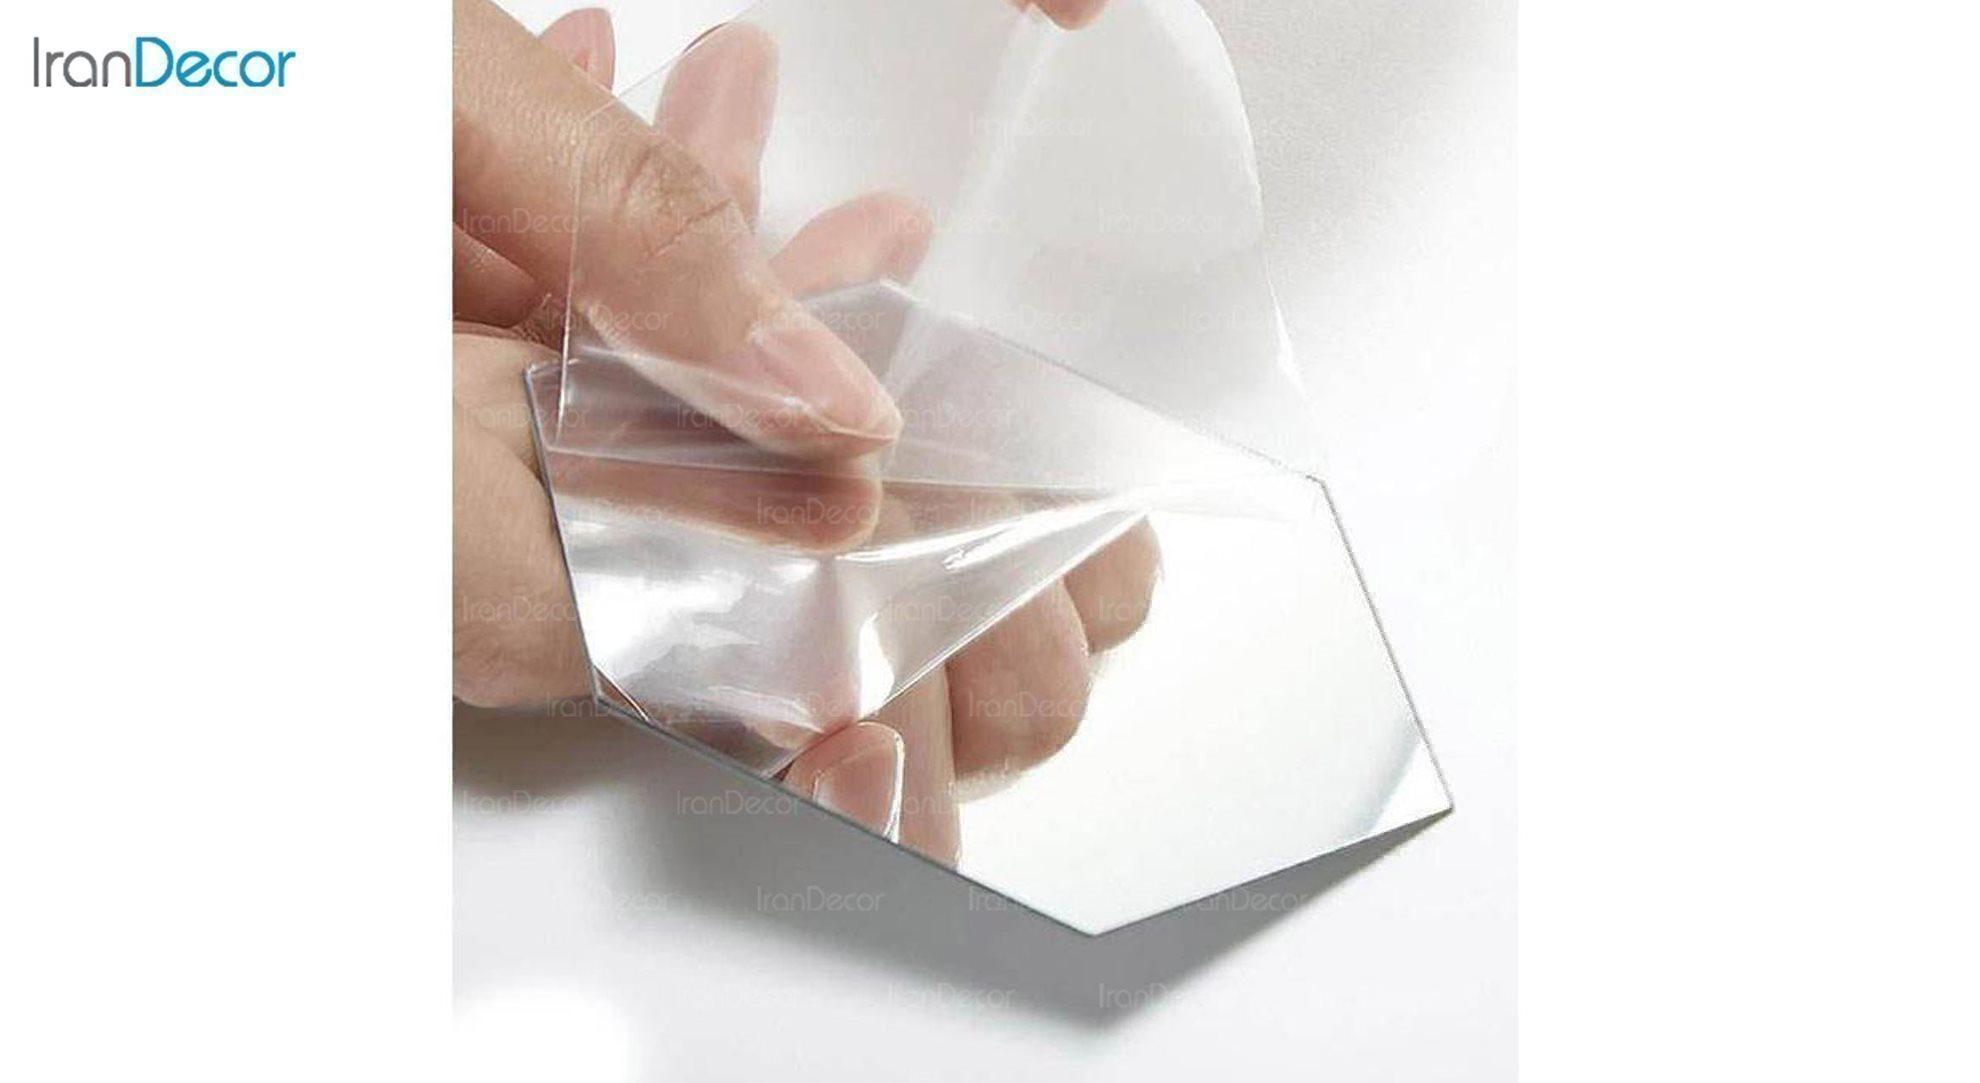 آینه پلکسی گلس طرح قلب رومادون کد 452 اندازه 20 سانتی متر نایلون ضد خش